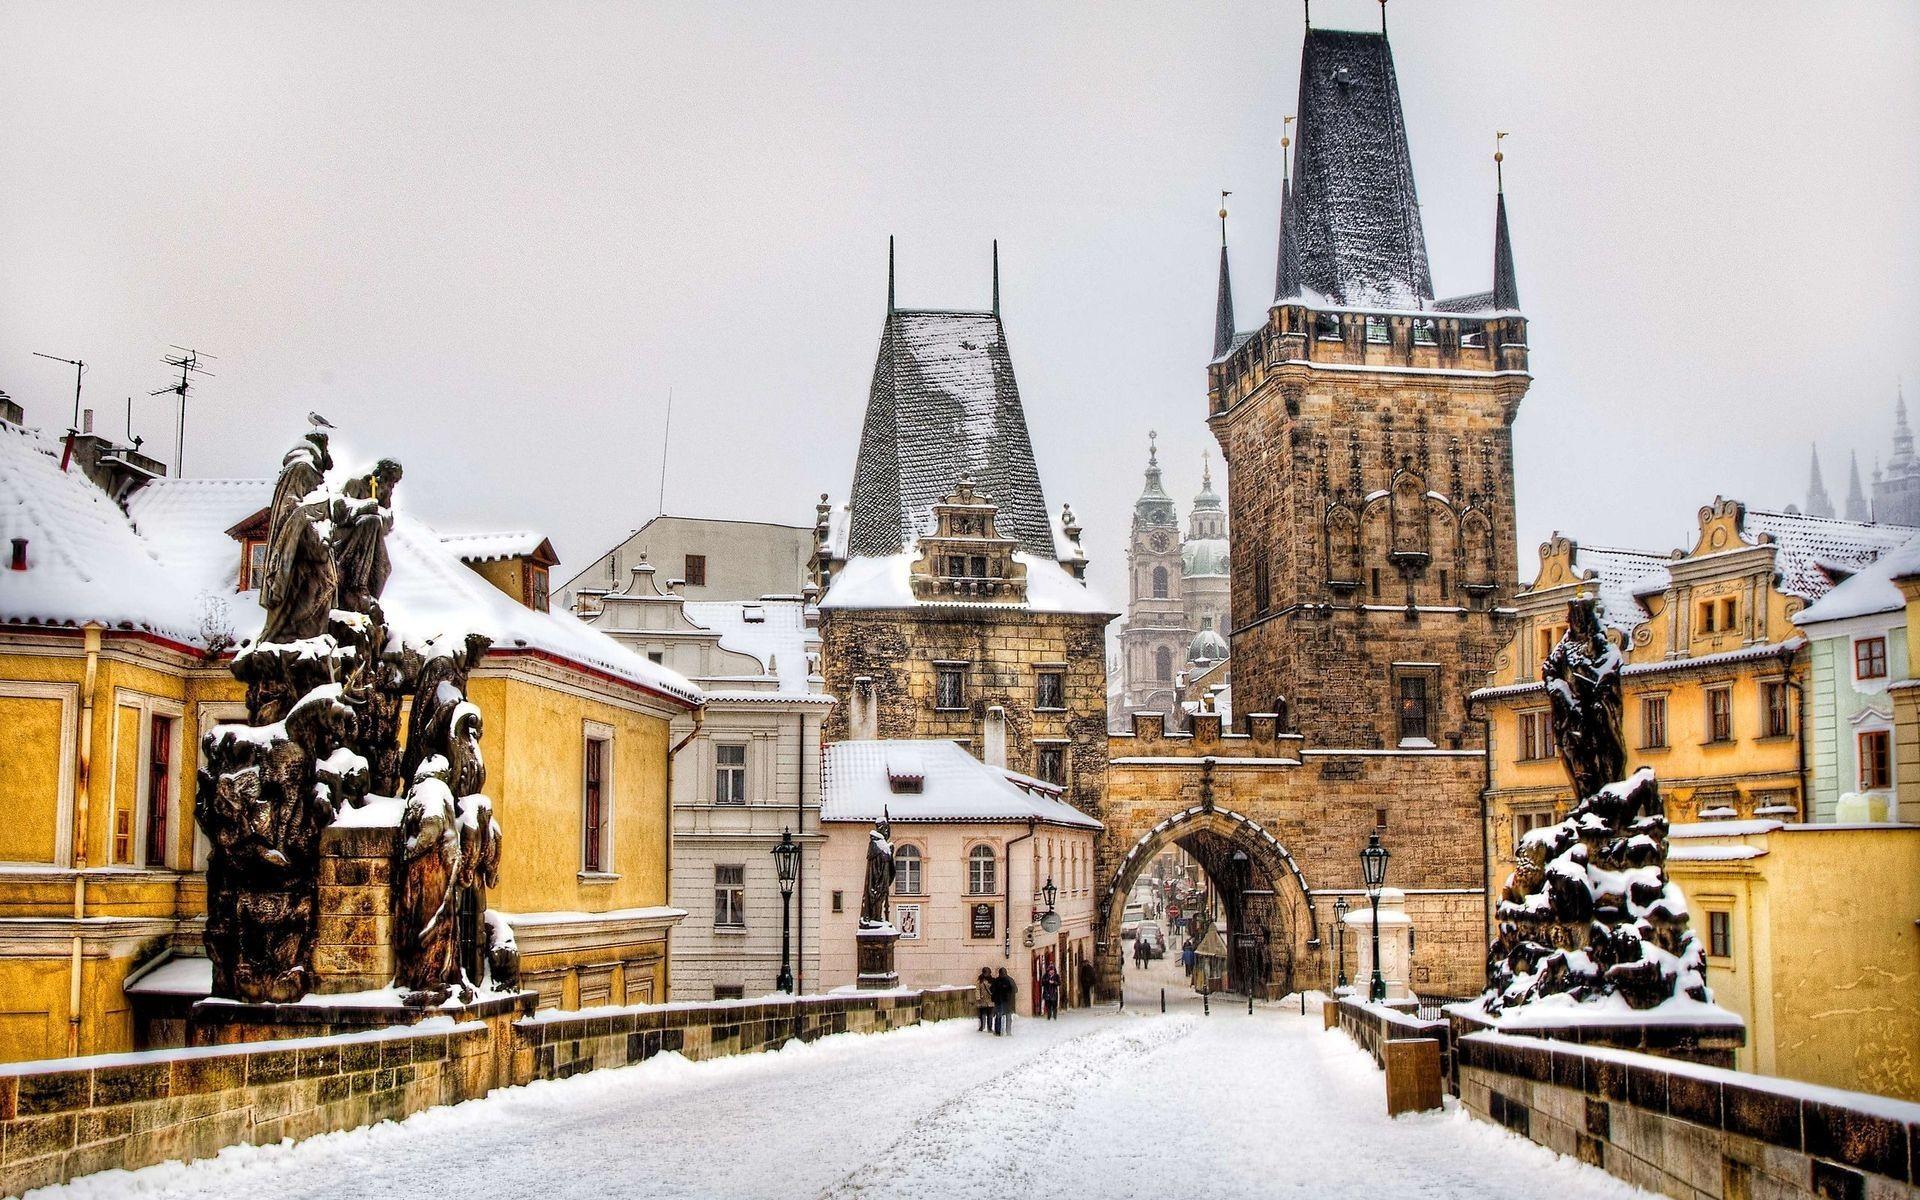 Winter desktops wallpapers – Pictures, Pics, Wallpapers, Images .